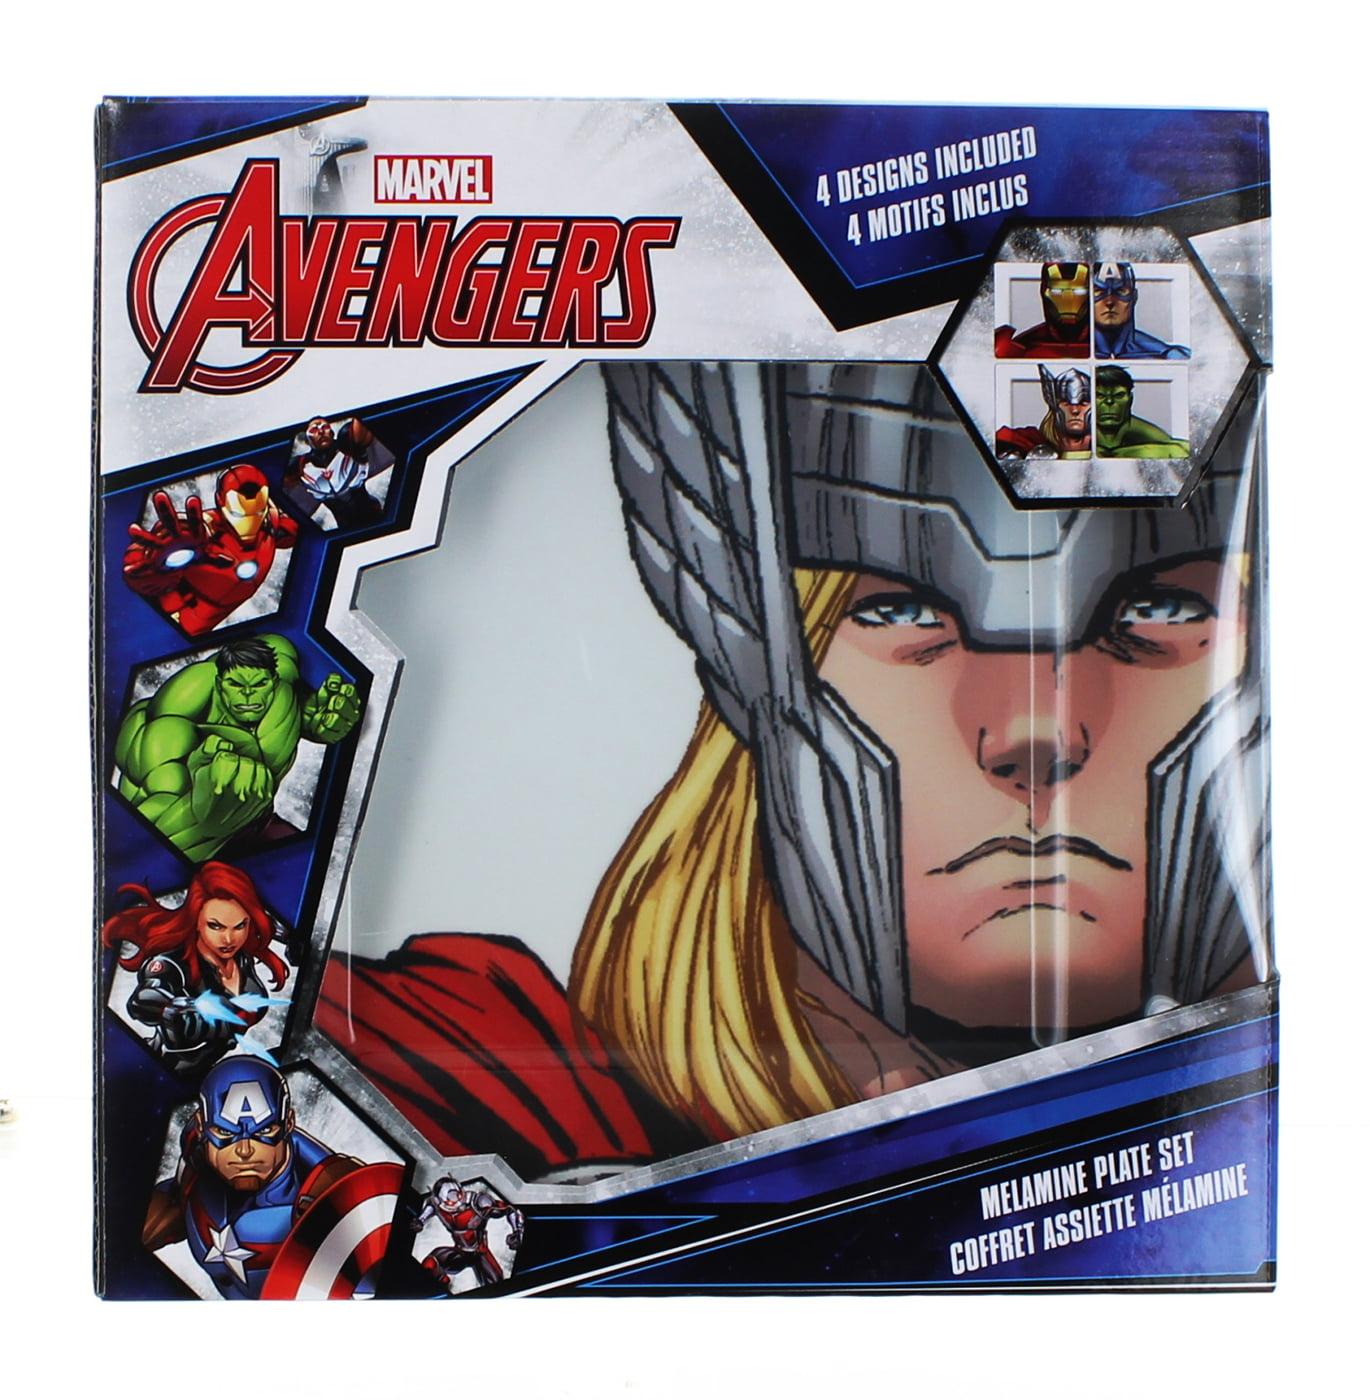 Marvel Avengers Melamine Plate Set, 4 Pieces